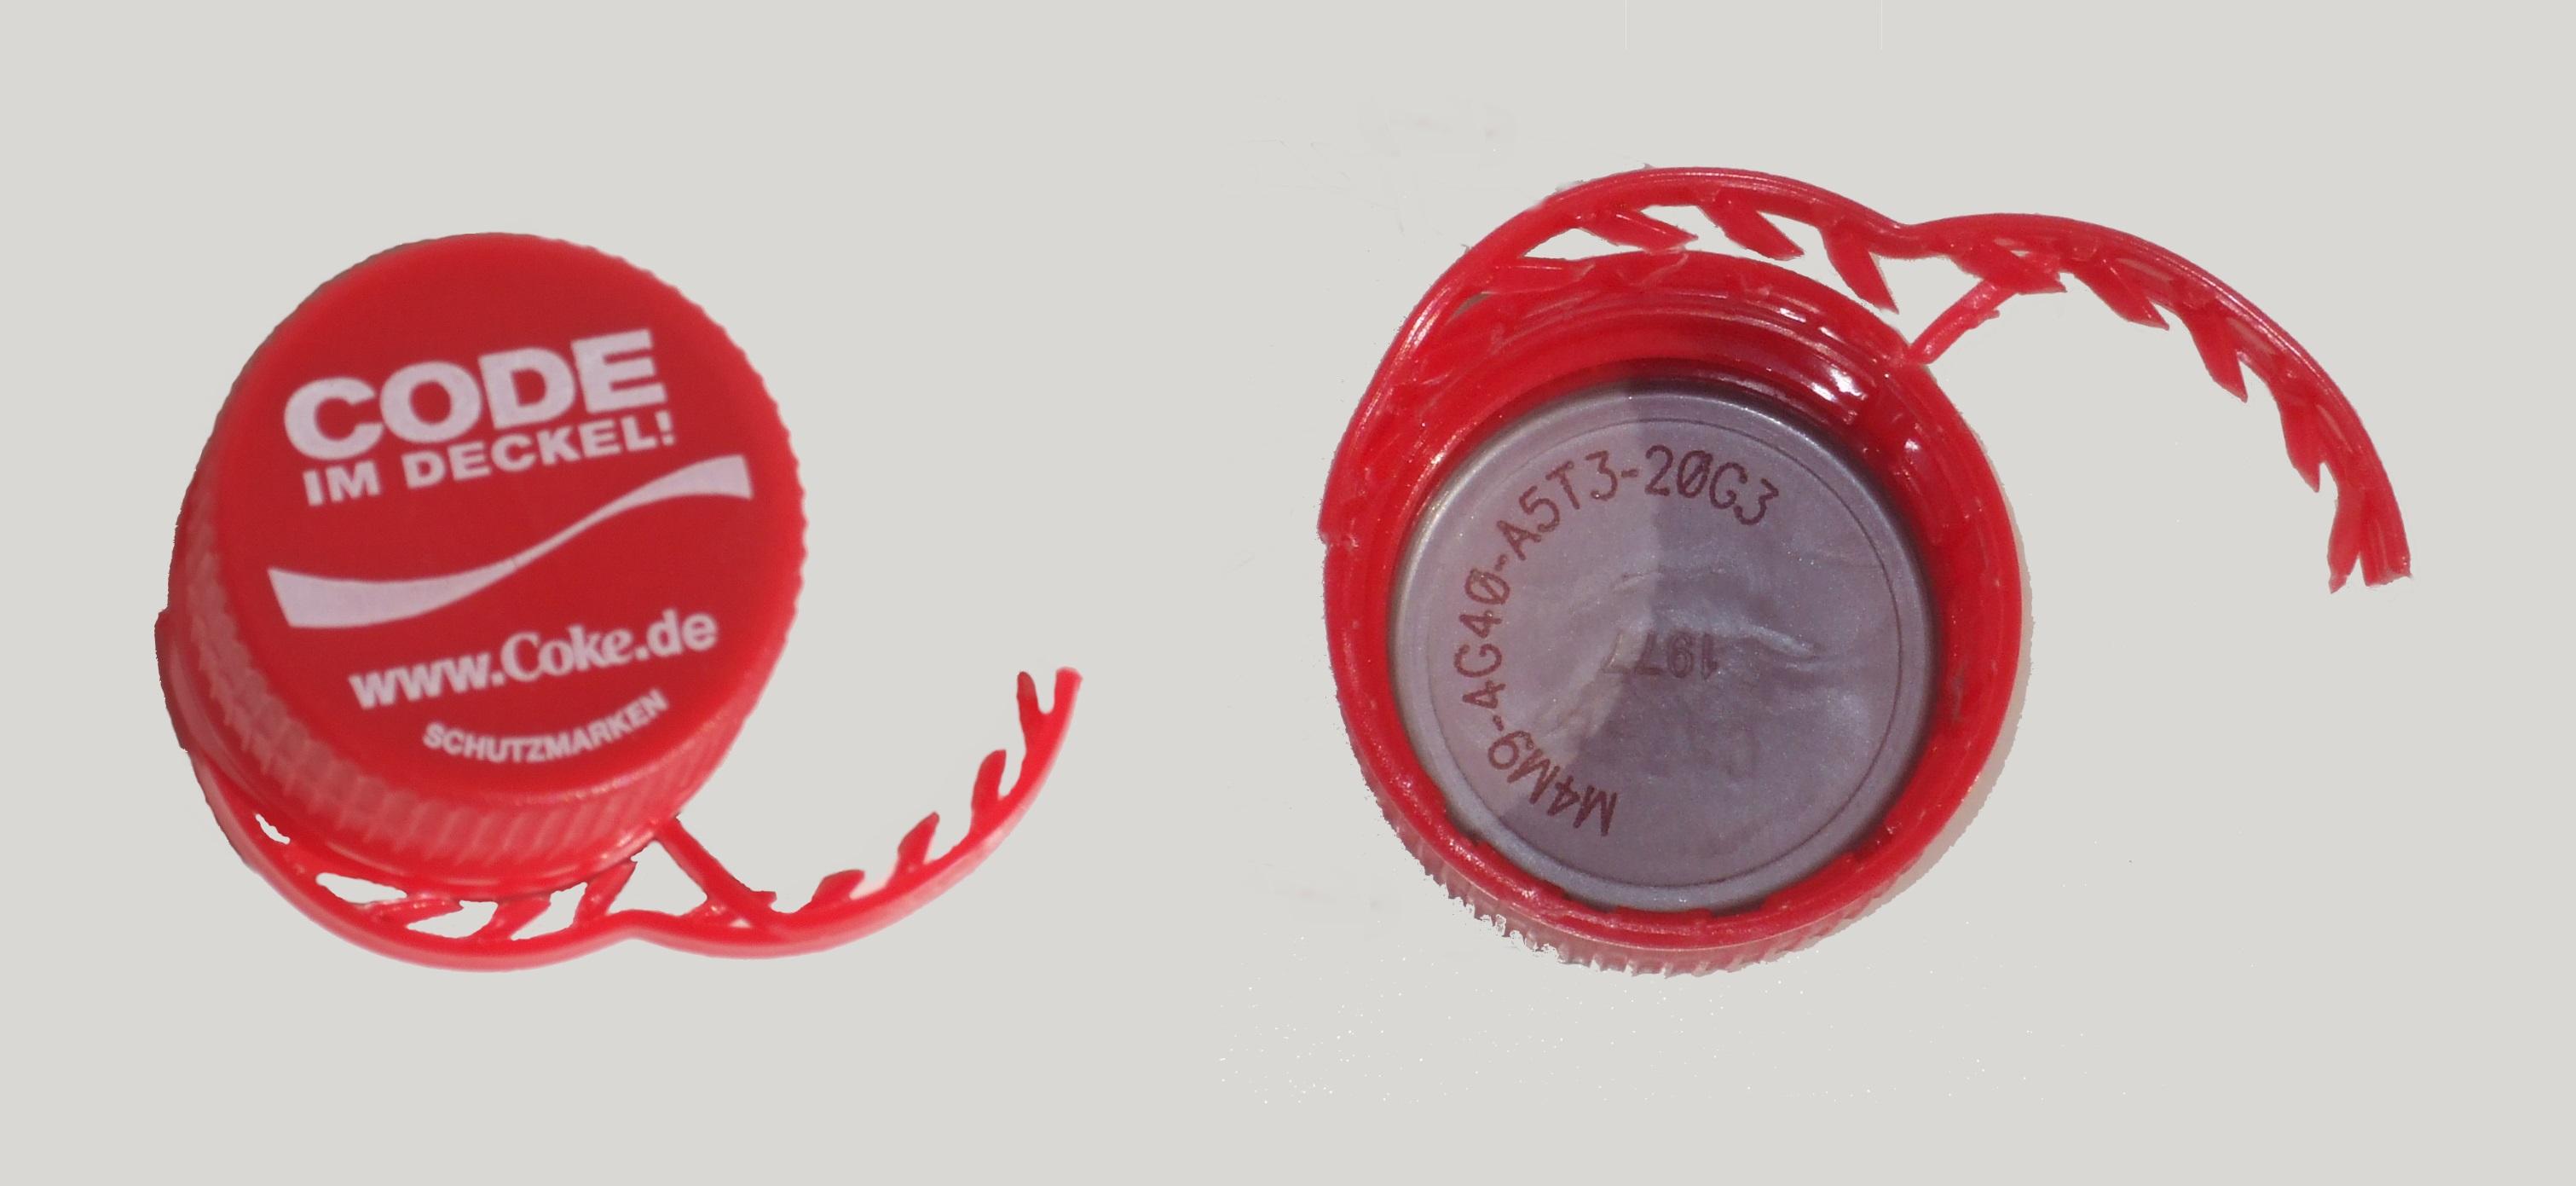 Cola Deckel Code